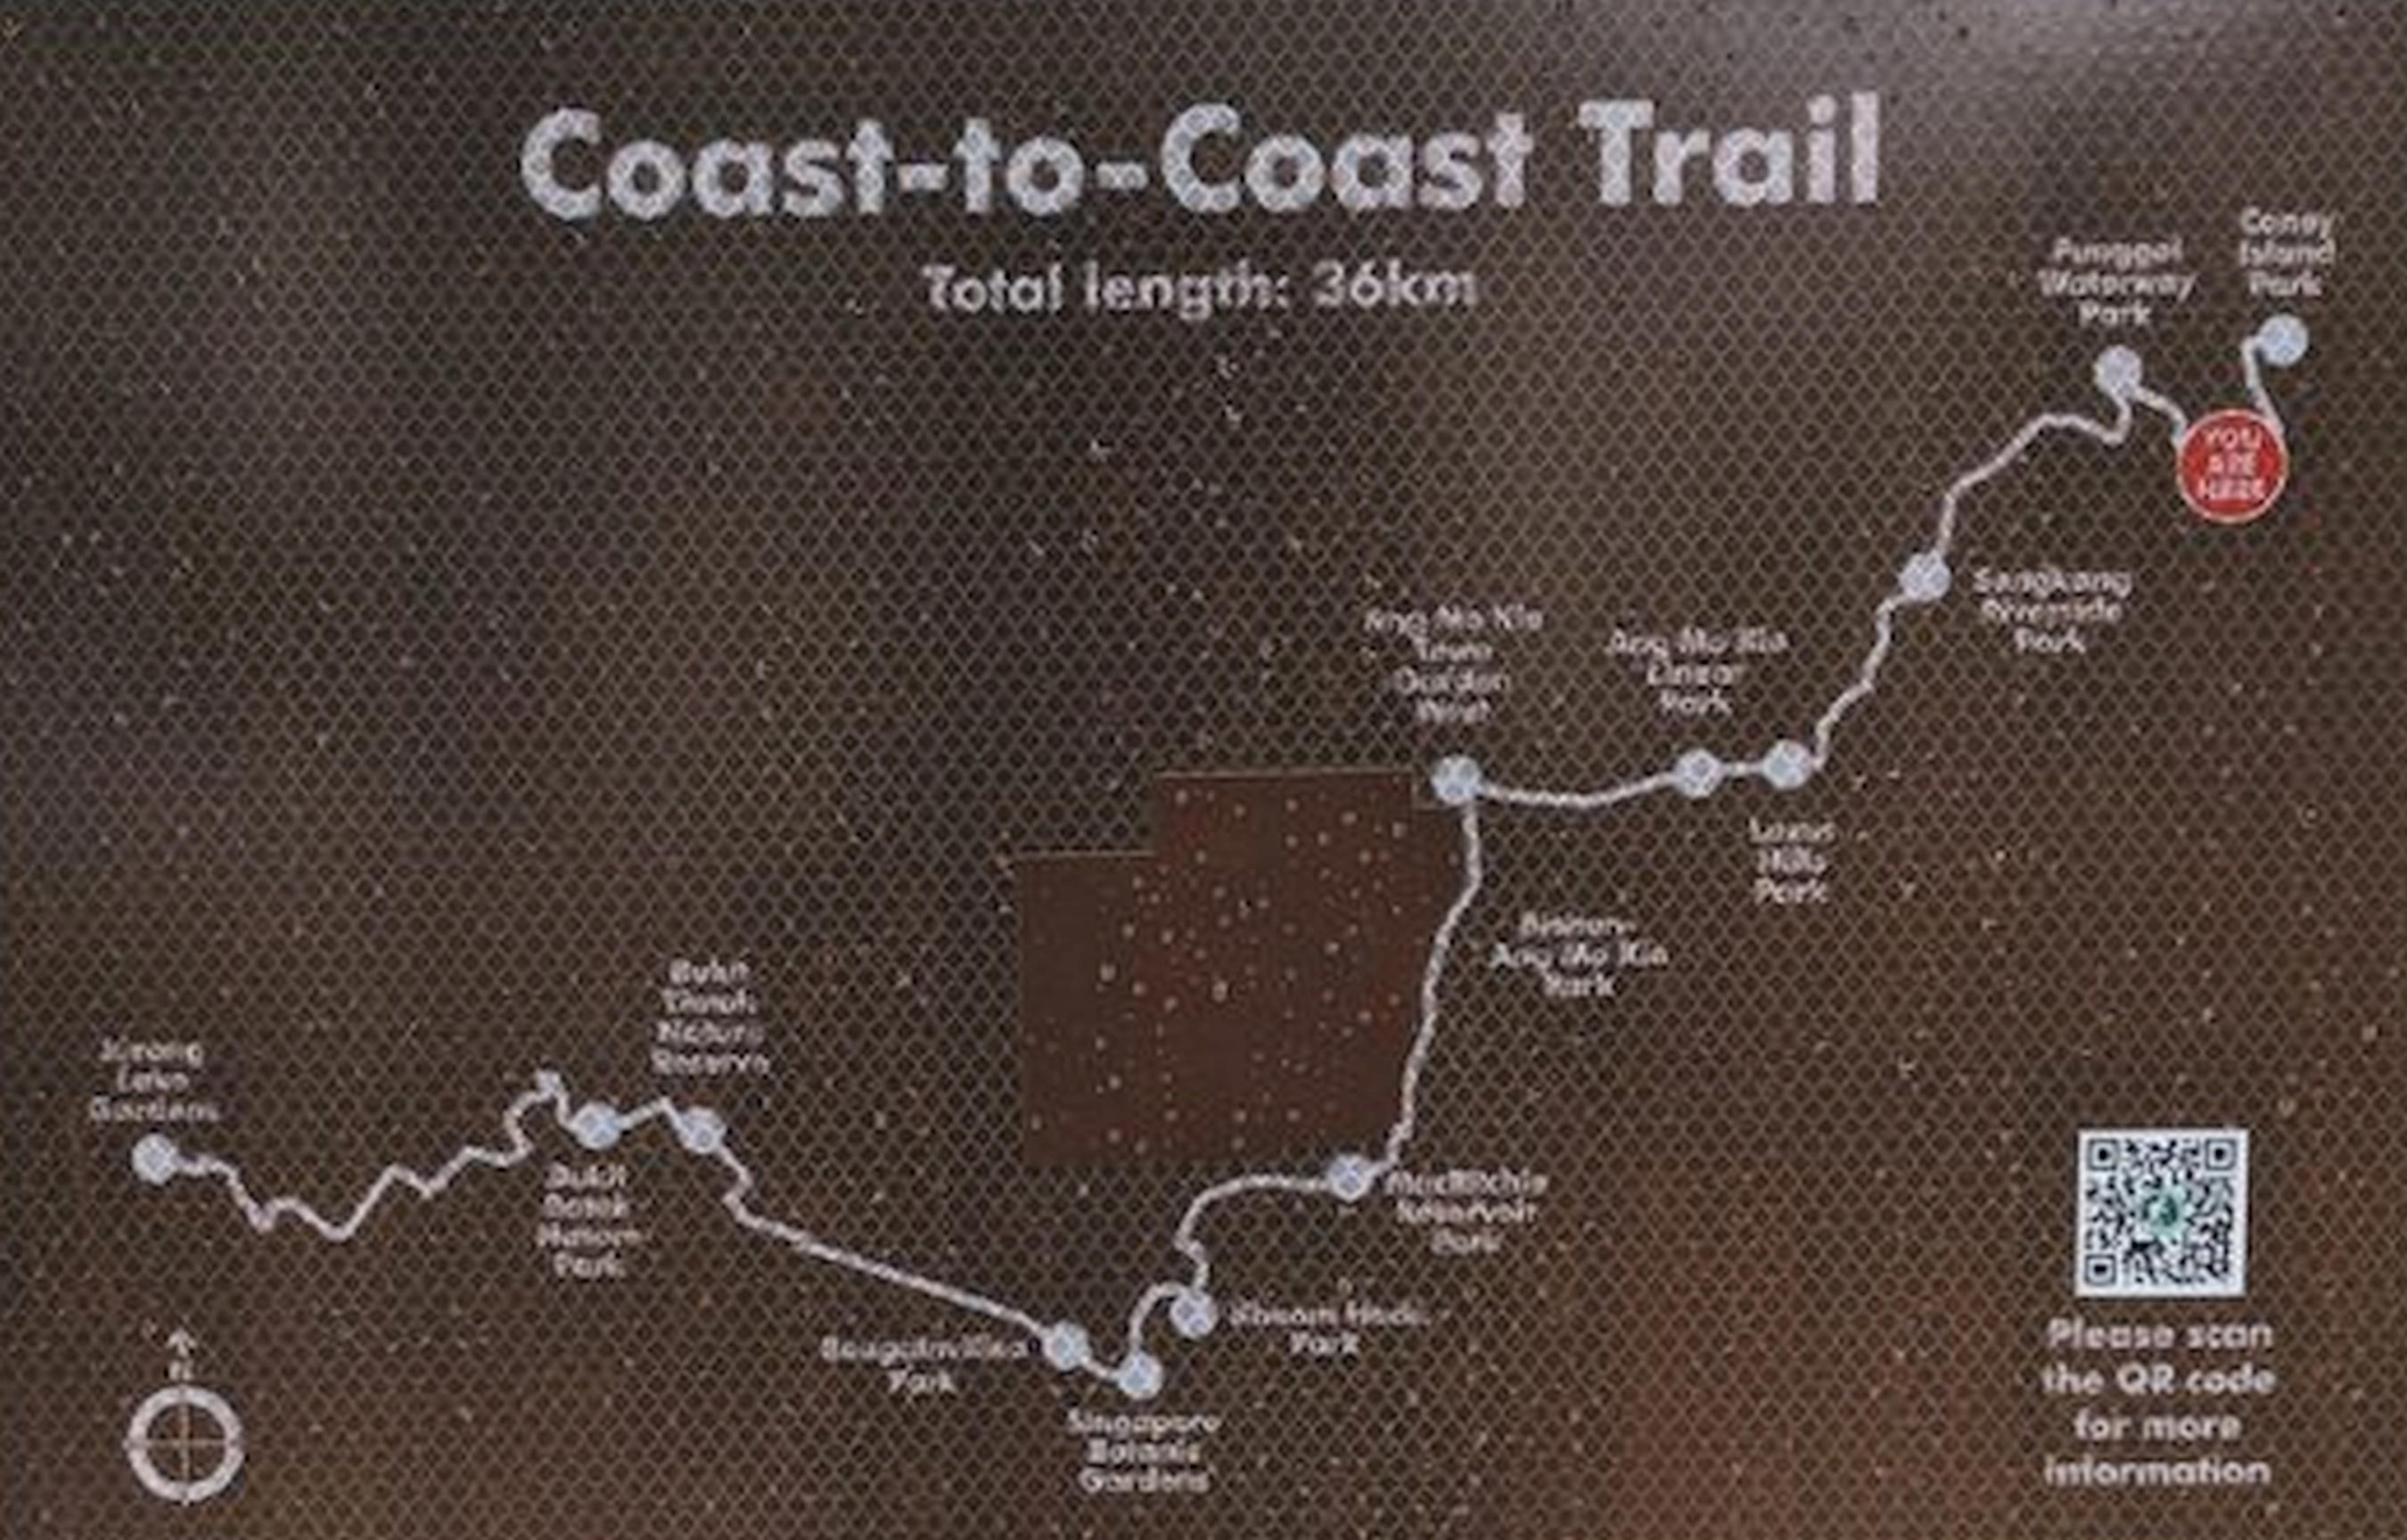 coast-to-coast-trail